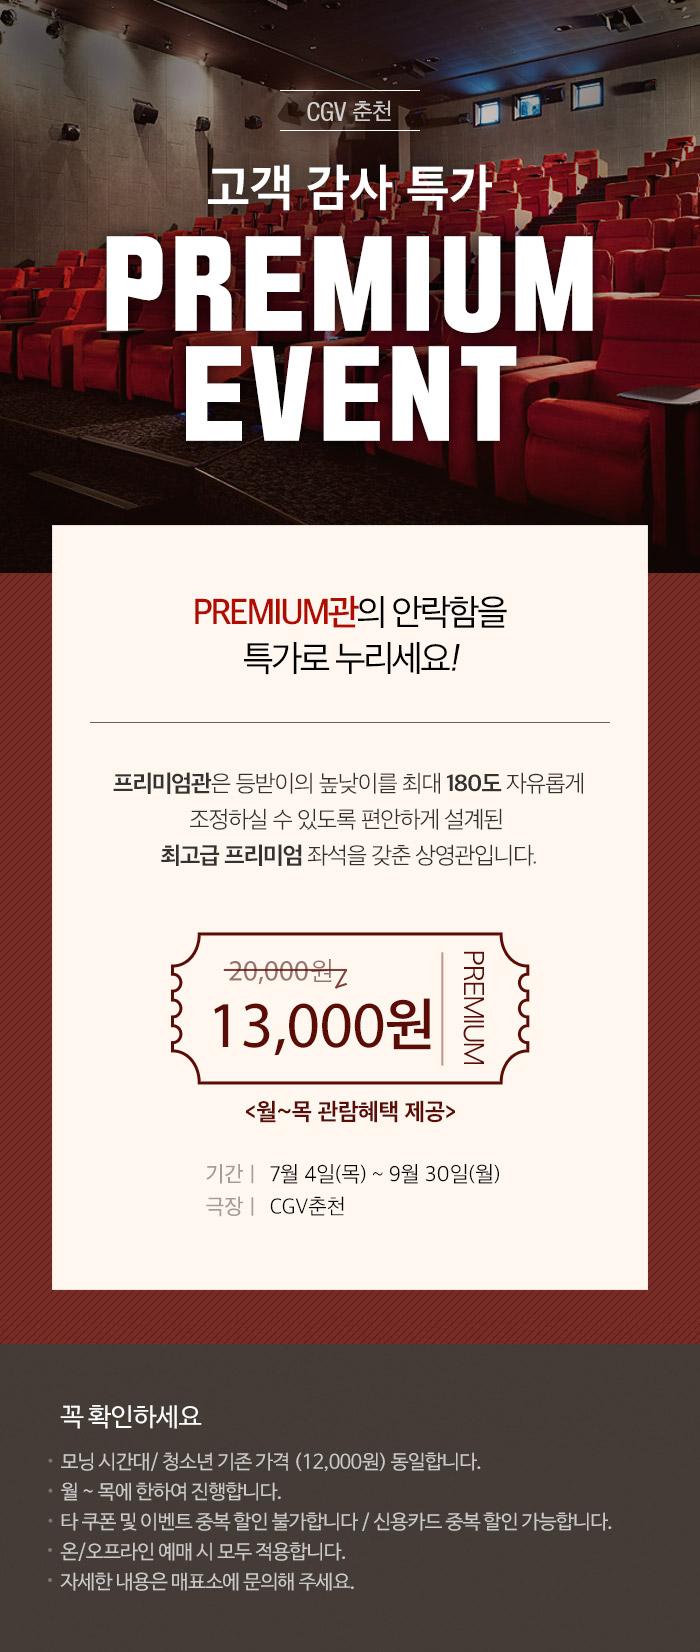 CGV극장별 [CGV춘천] Premium관 고객 감사 특가 프로모션 이벤트